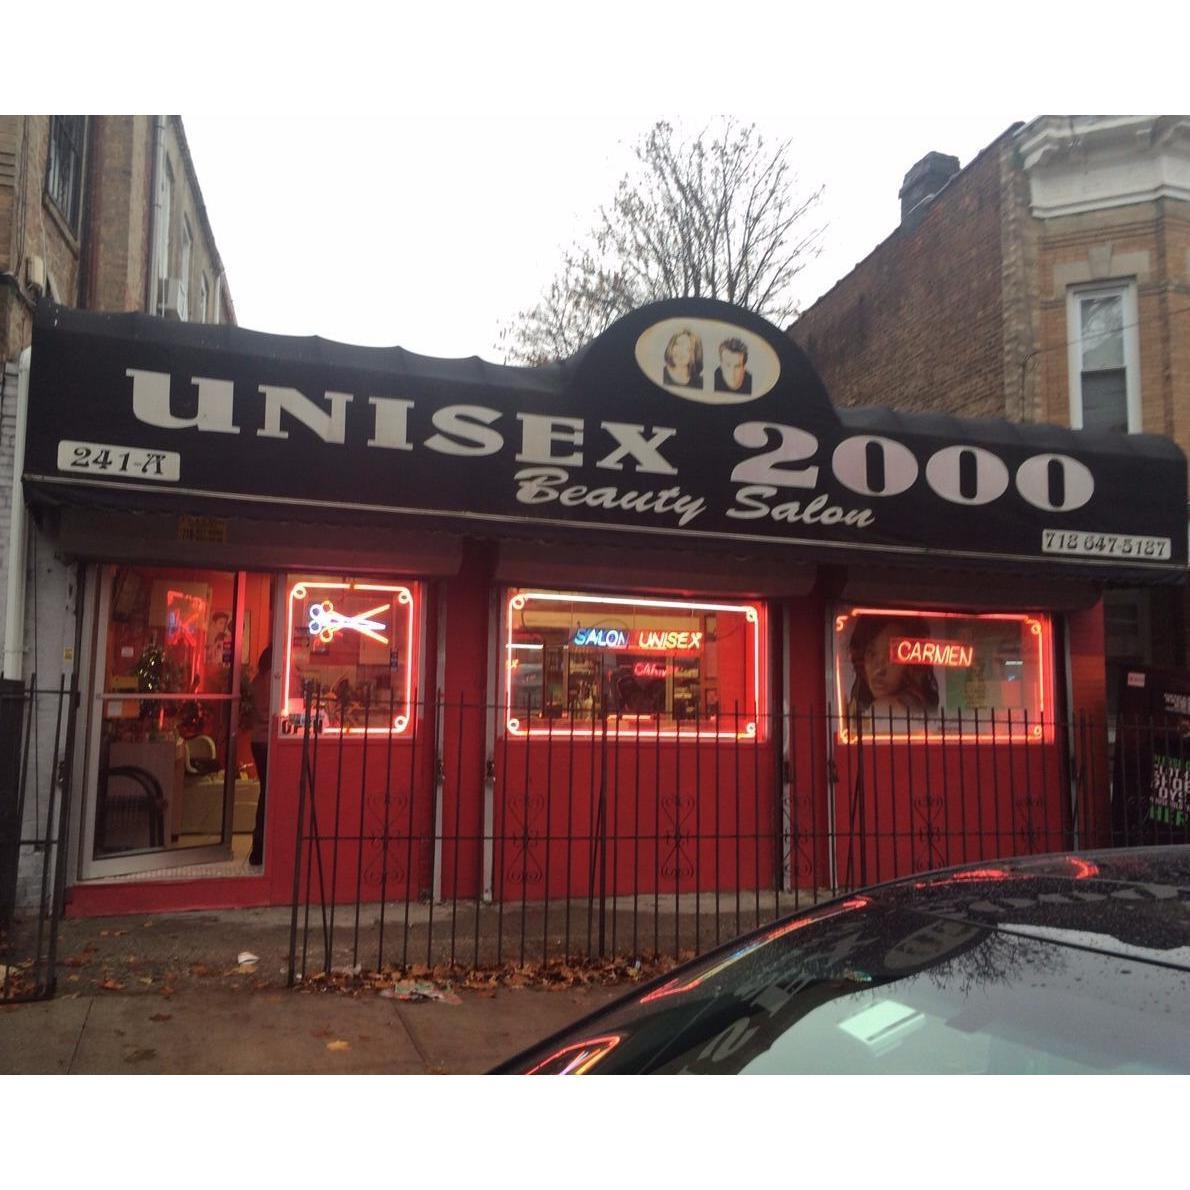 Unisex 2000 beauty salon in brooklyn ny 11208 for Salon 2000 compiegne